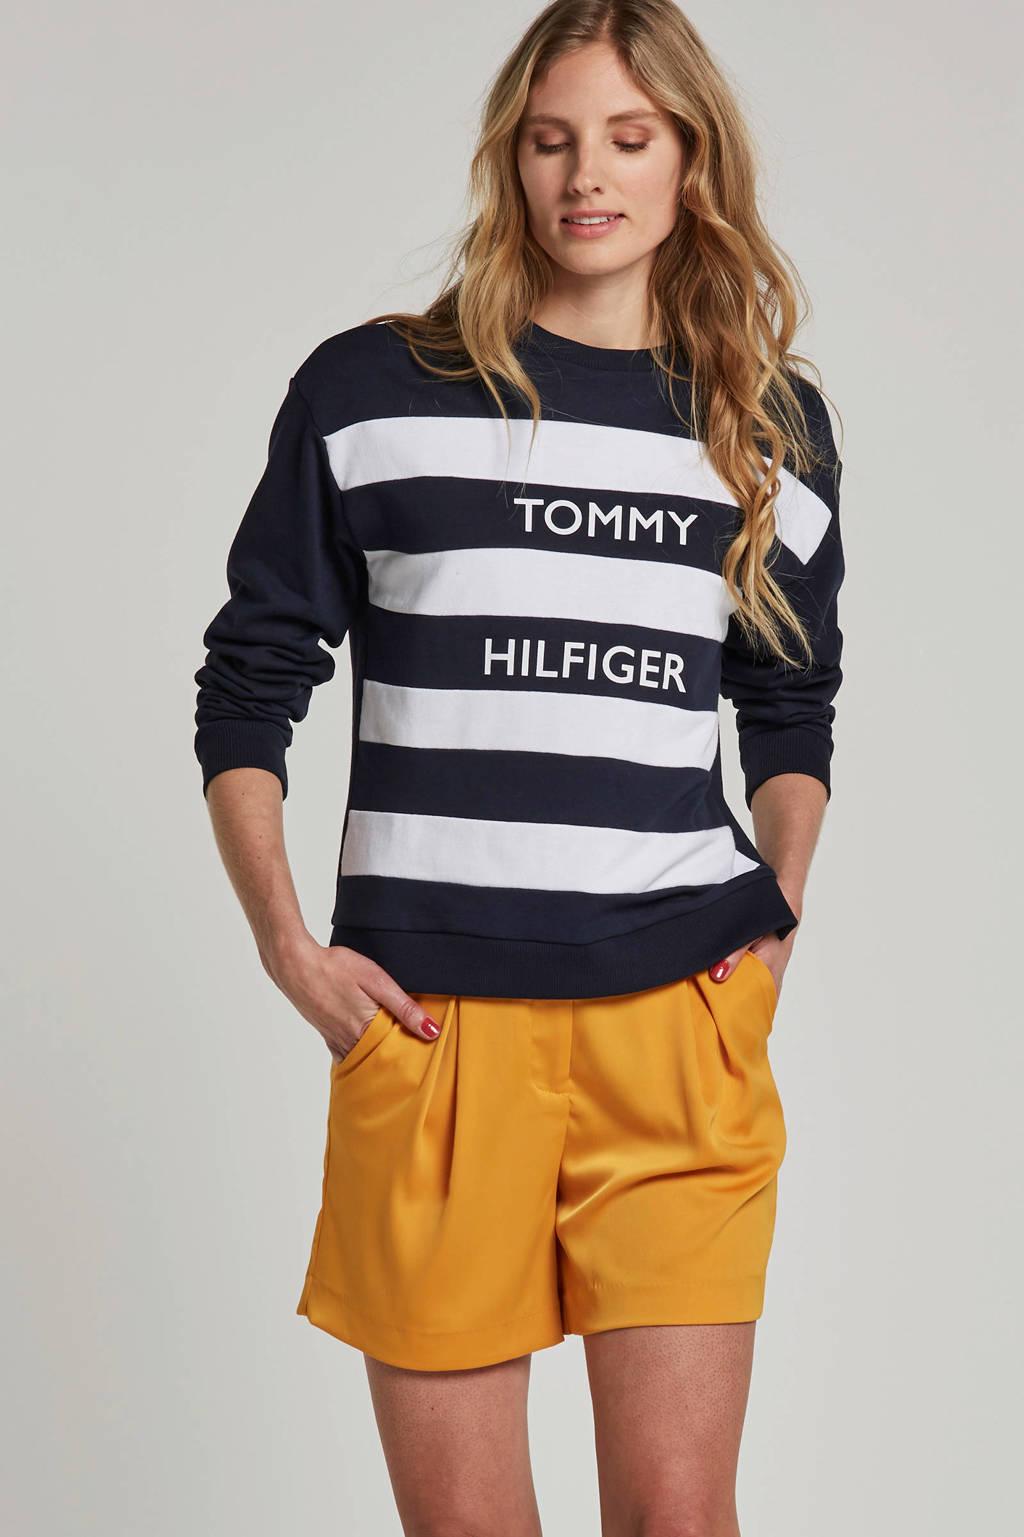 Tommy Hilfiger gestreepte trui met printopdruk, Blauw/wit